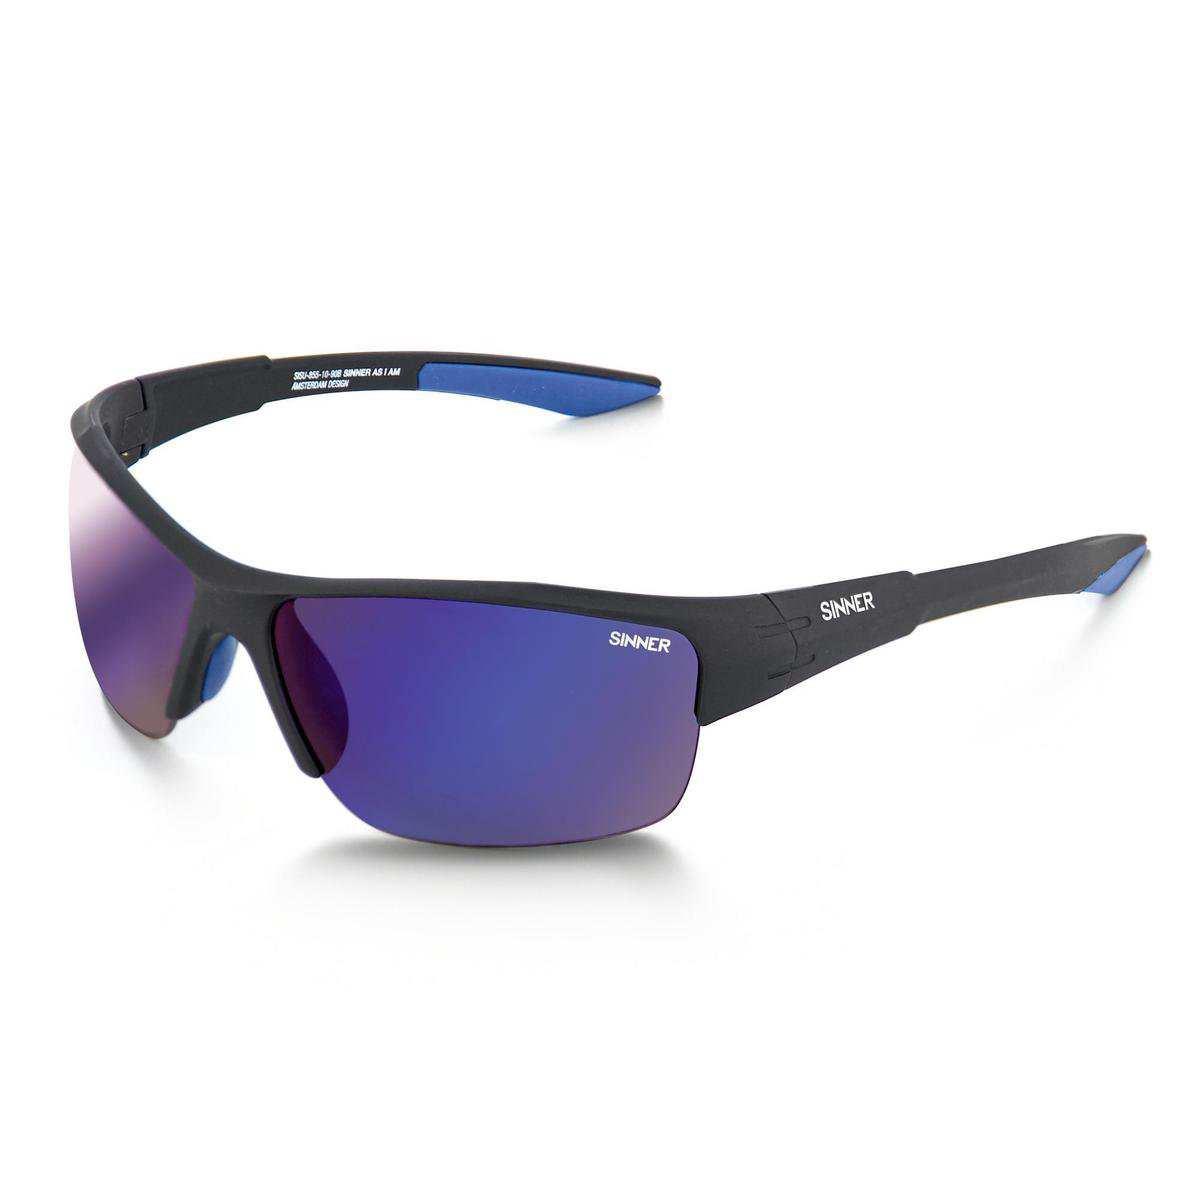 Sunglasses Sport Summer Sinner Reyes